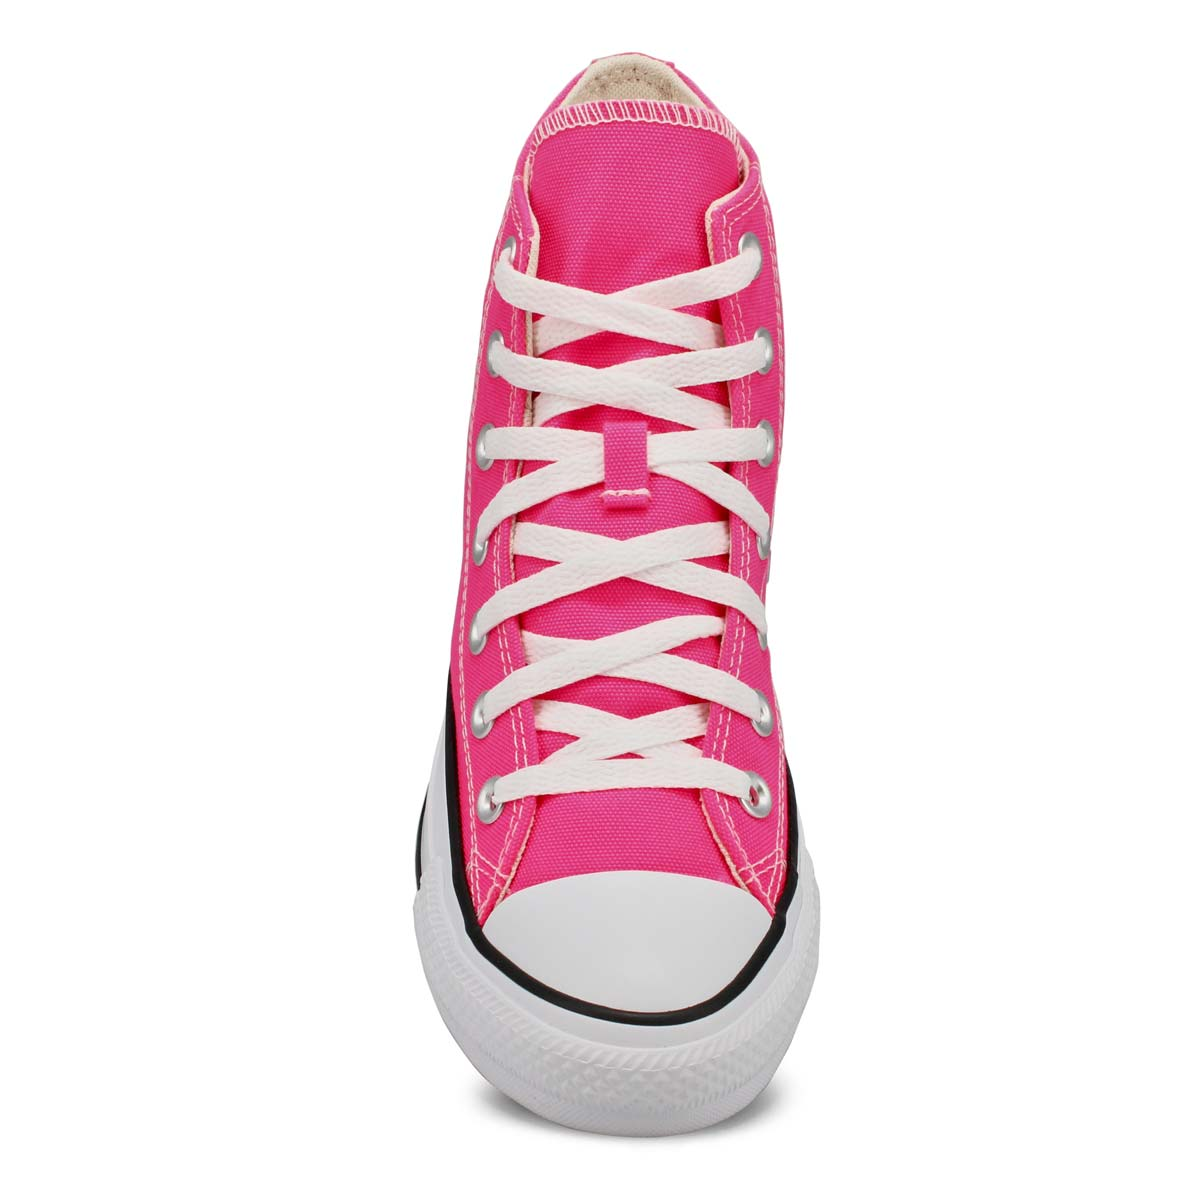 Women's All Star Seasonal Hi Top Sneaker -Hyper Pk